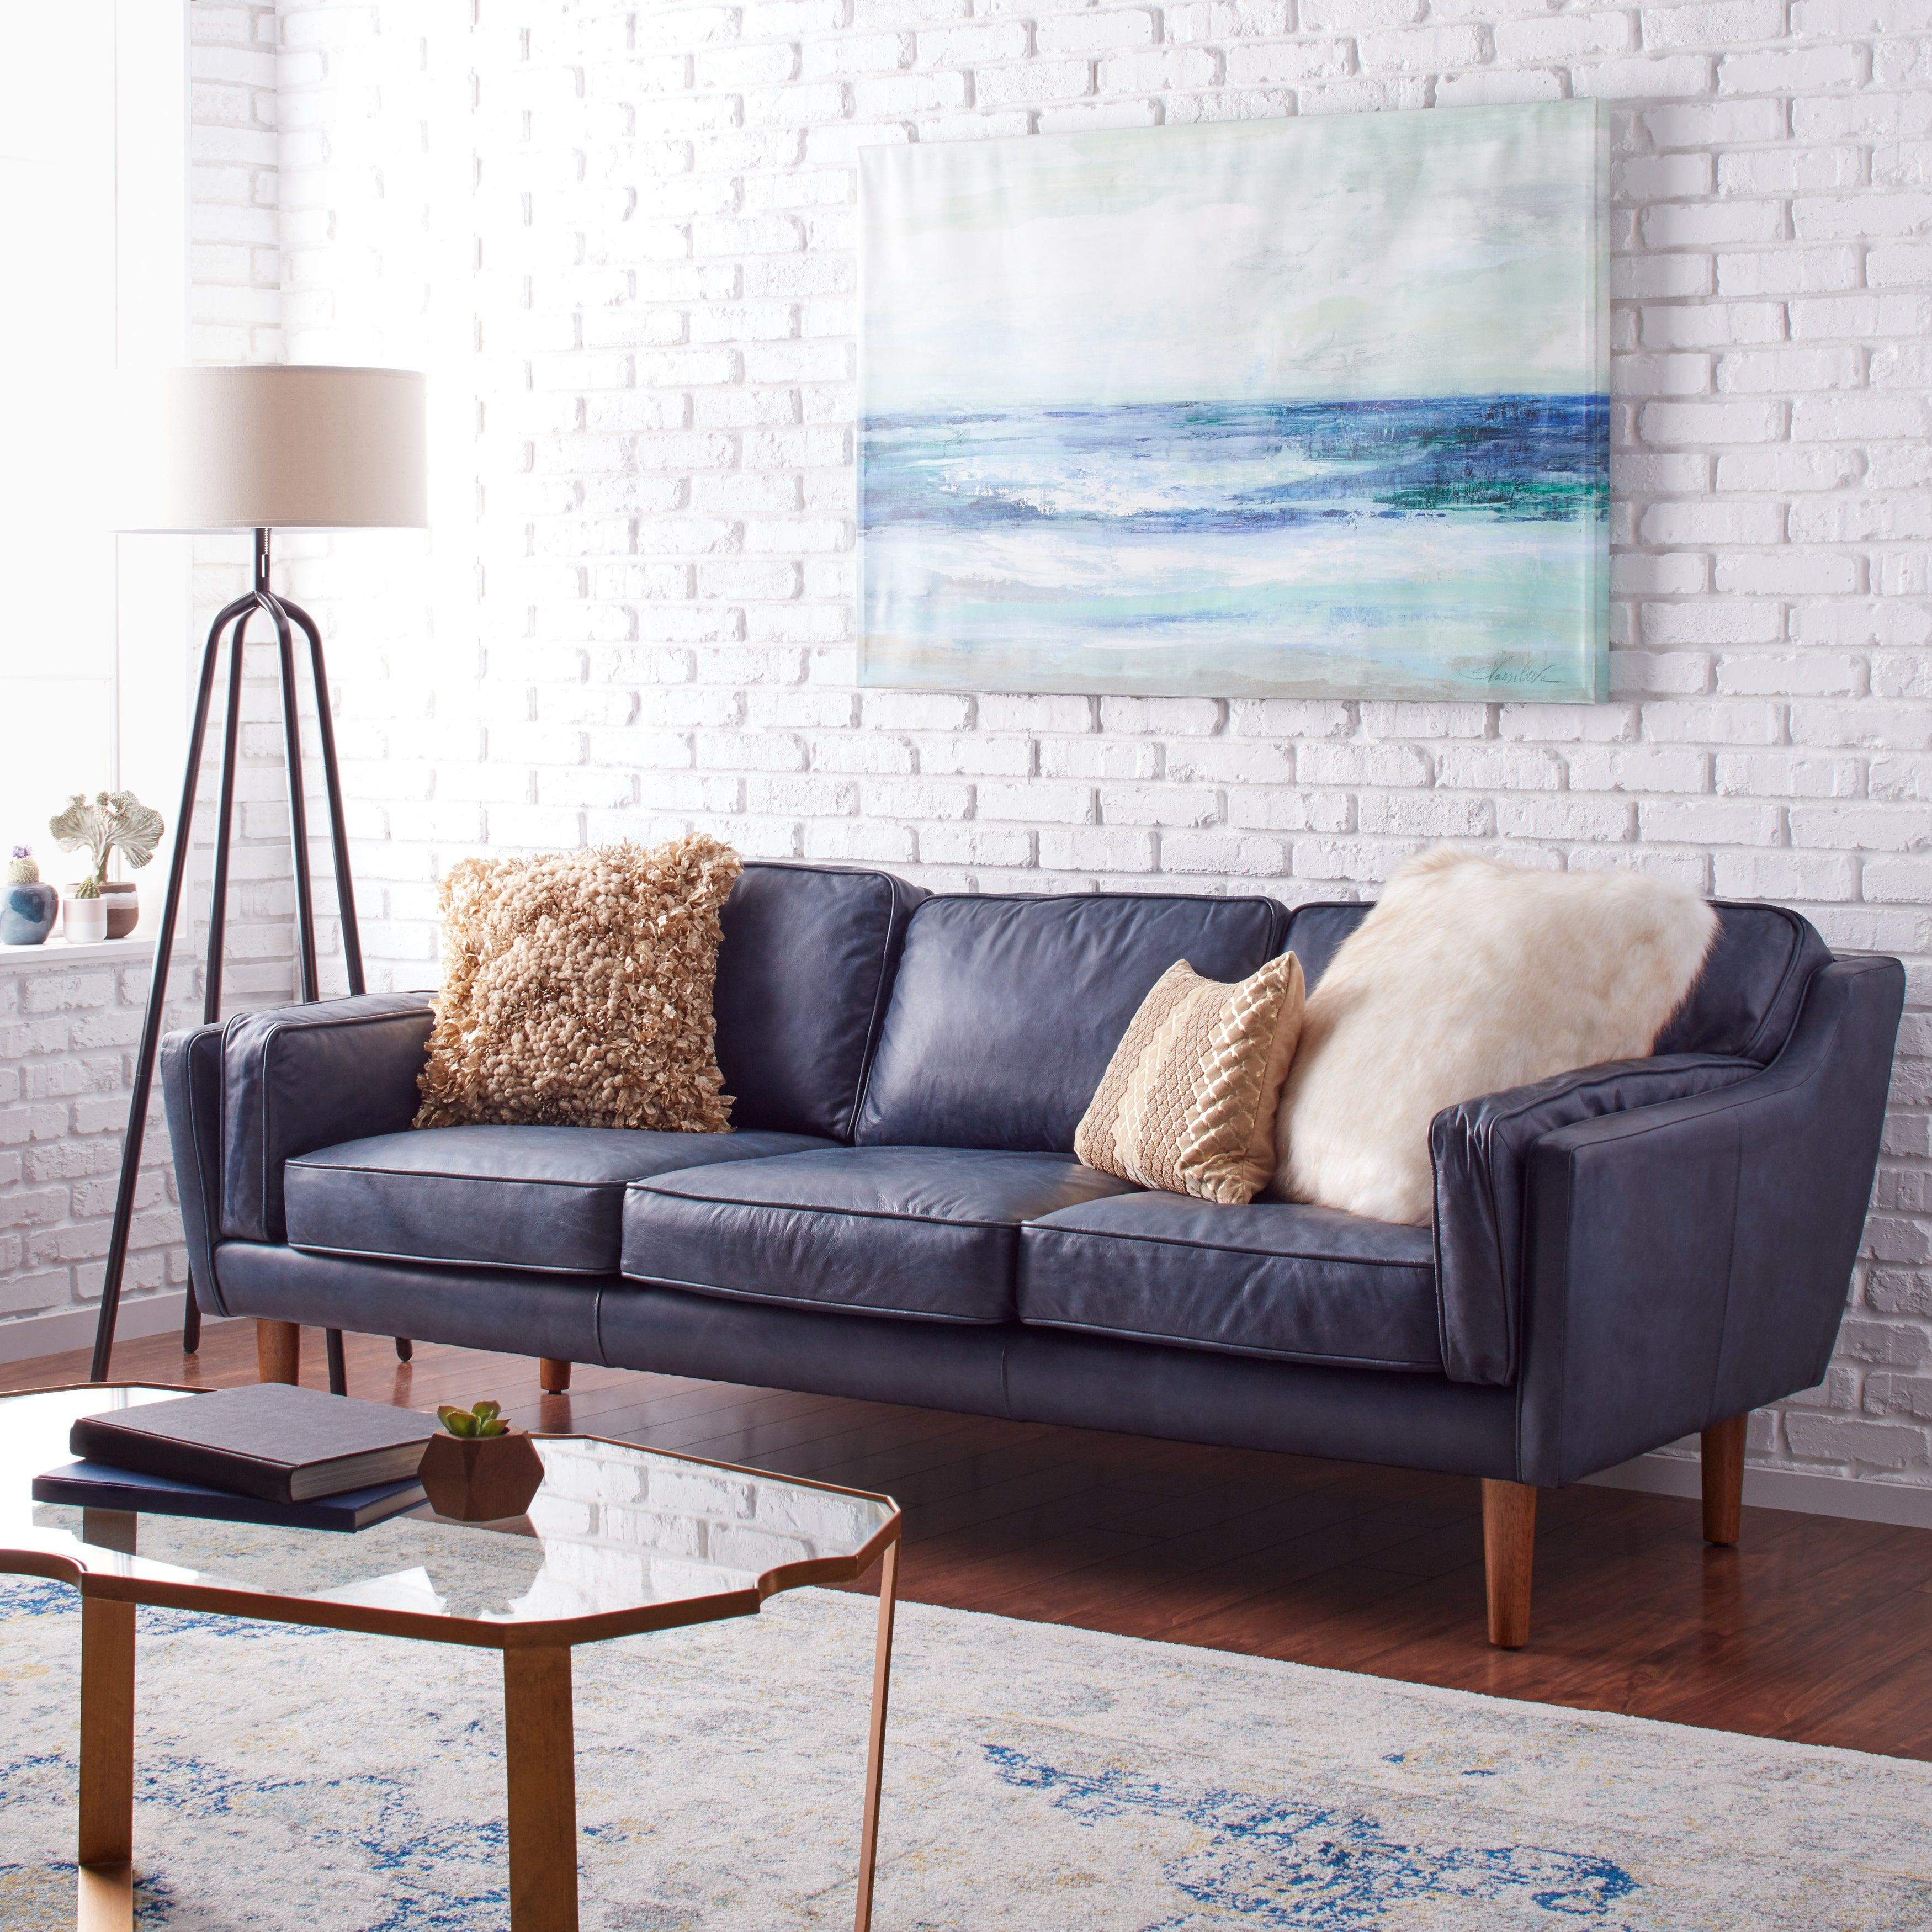 Beatnik Oxford Leather Blue Sofa